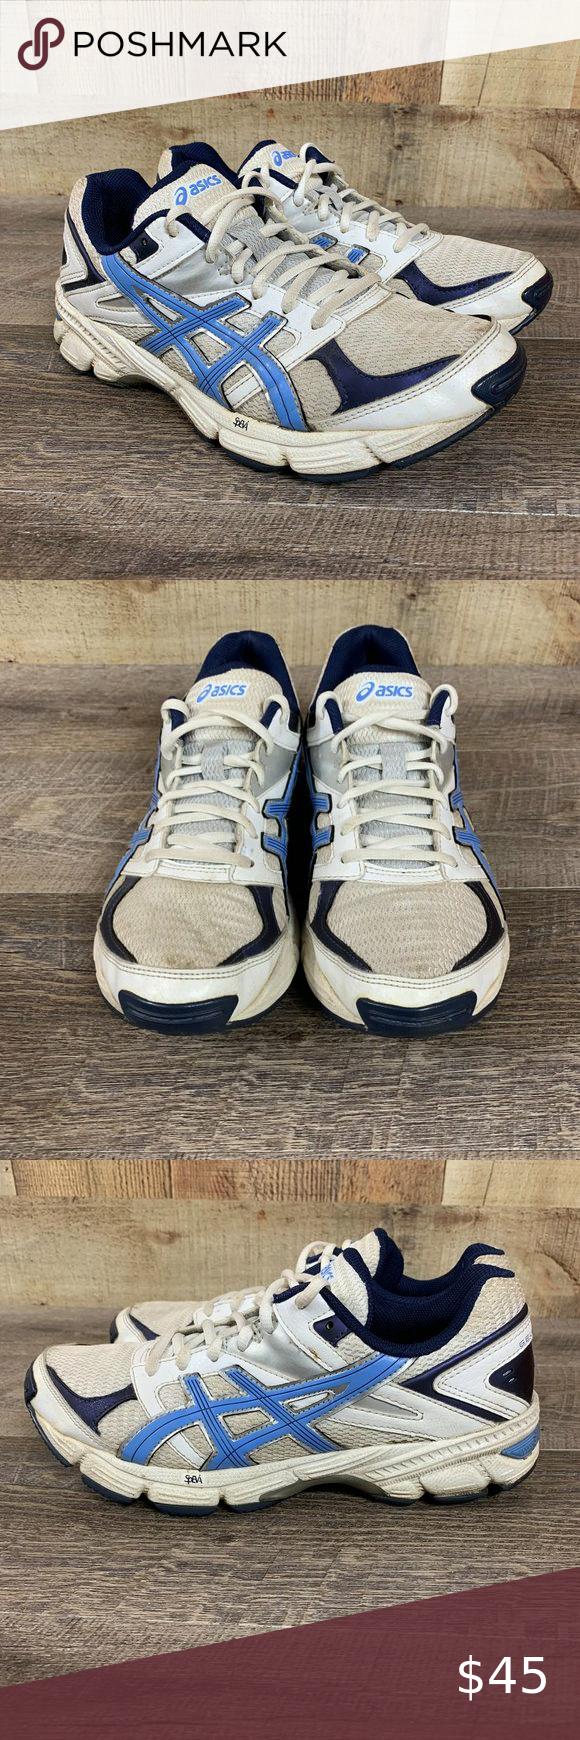 Eso marea Shuraba  Asics Gel 190TR Women's Sz 8.5 Running Shoe S571N in 2020 | Fashion trends,  Clothes design, Women